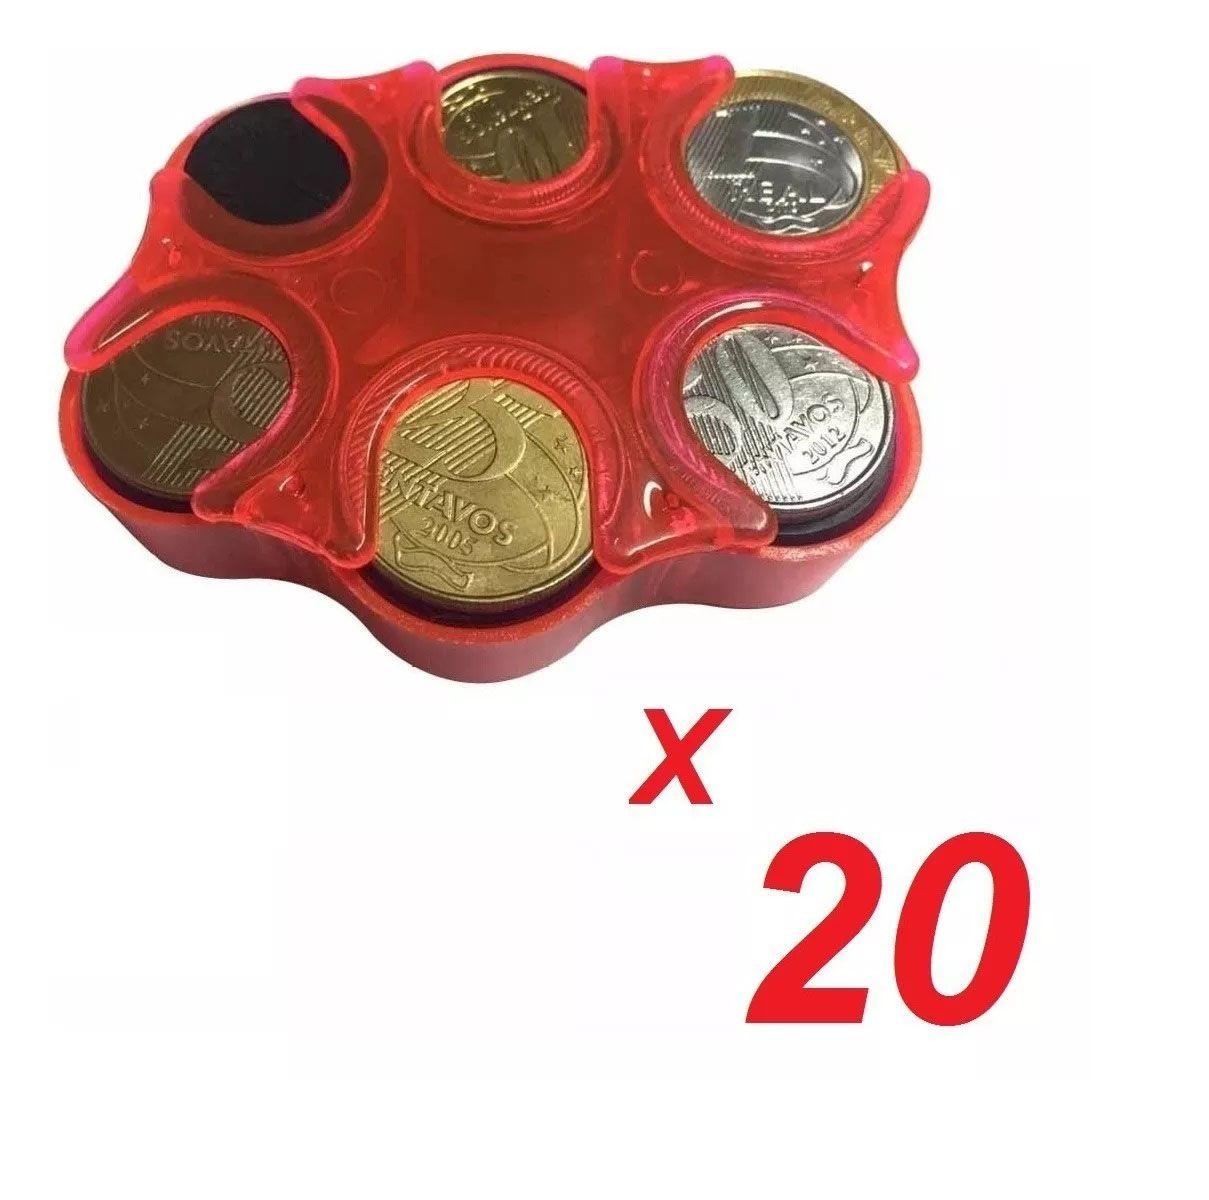 KIT 20 Porta Moedas Bolso Organizador Dinheiro Loja  - EKENOX- Equipamentos Industriais